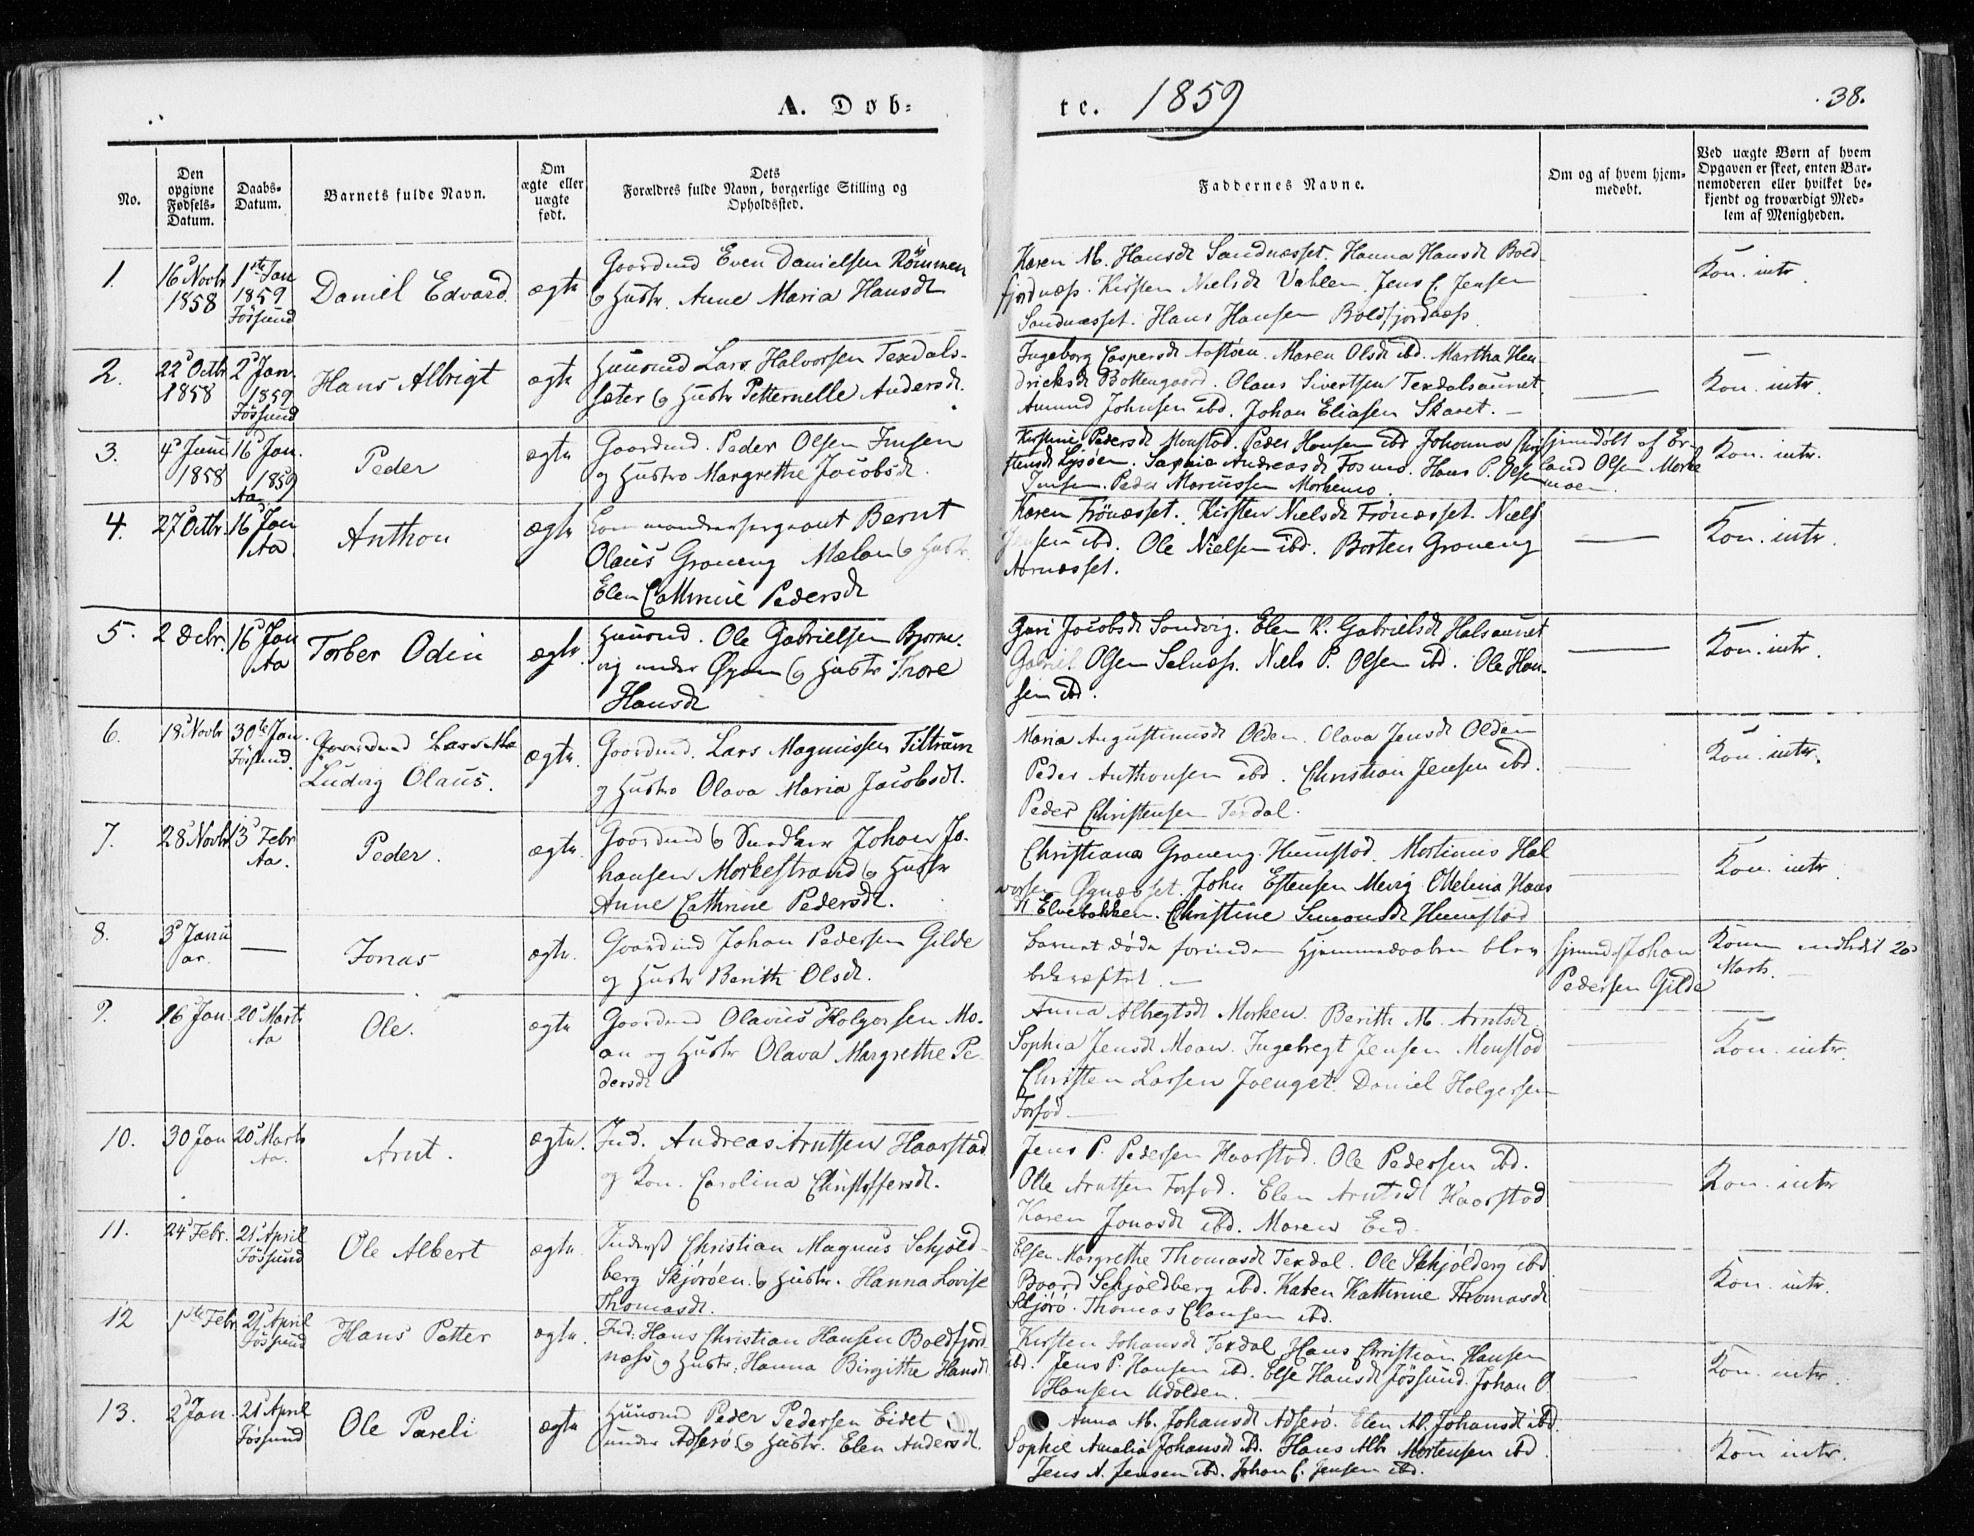 SAT, Ministerialprotokoller, klokkerbøker og fødselsregistre - Sør-Trøndelag, 655/L0677: Parish register (official) no. 655A06, 1847-1860, p. 38